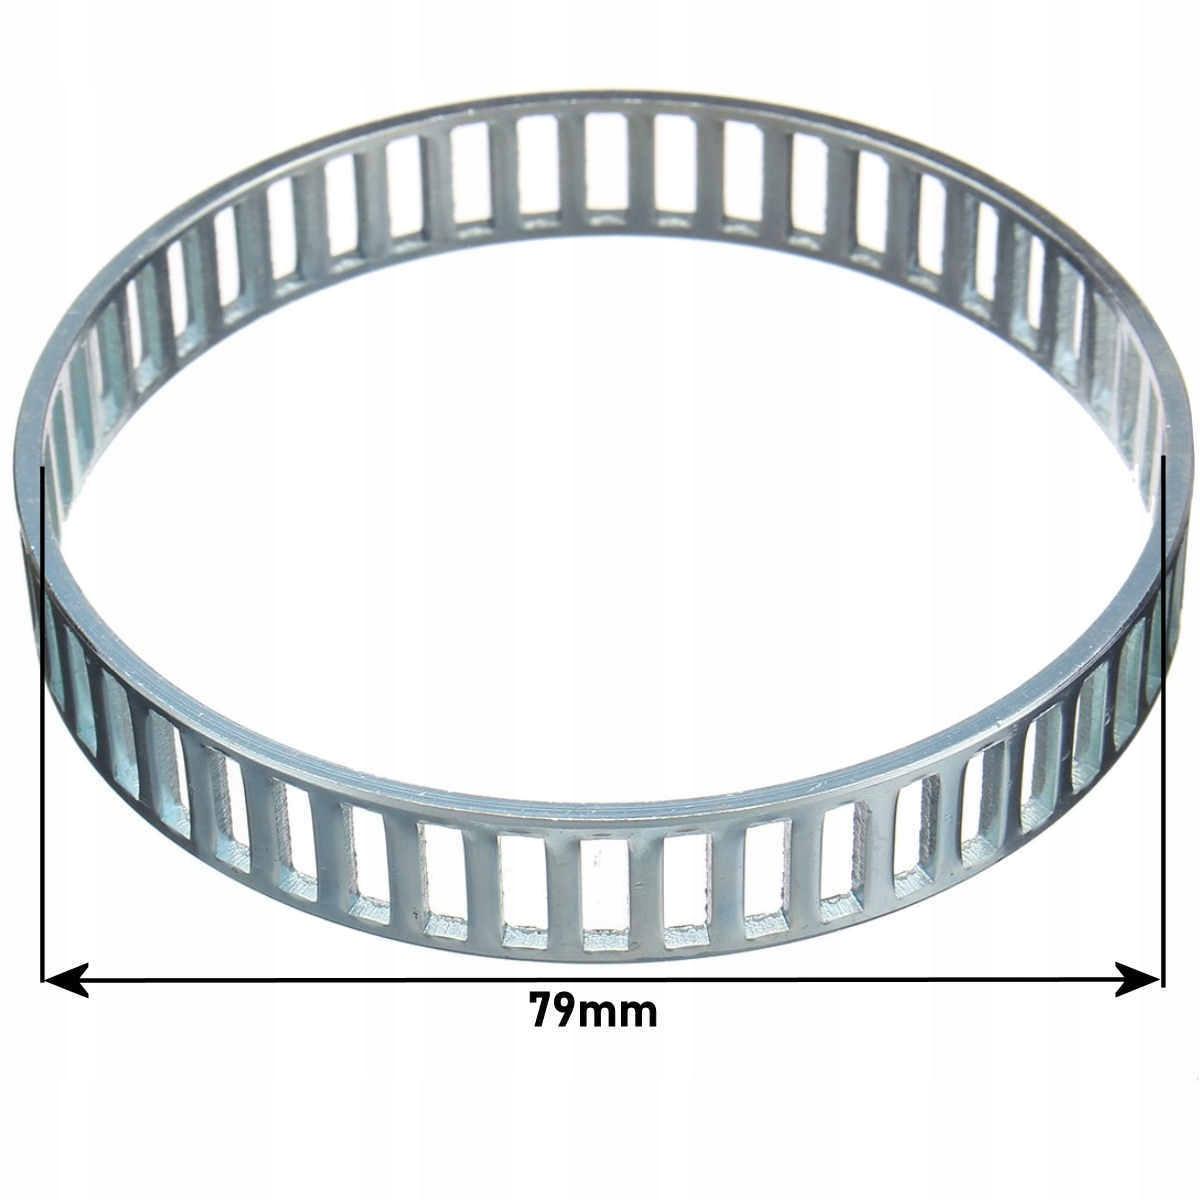 pierścień abs koronka зад bmw e46 e81 e82 e87 e90, фото